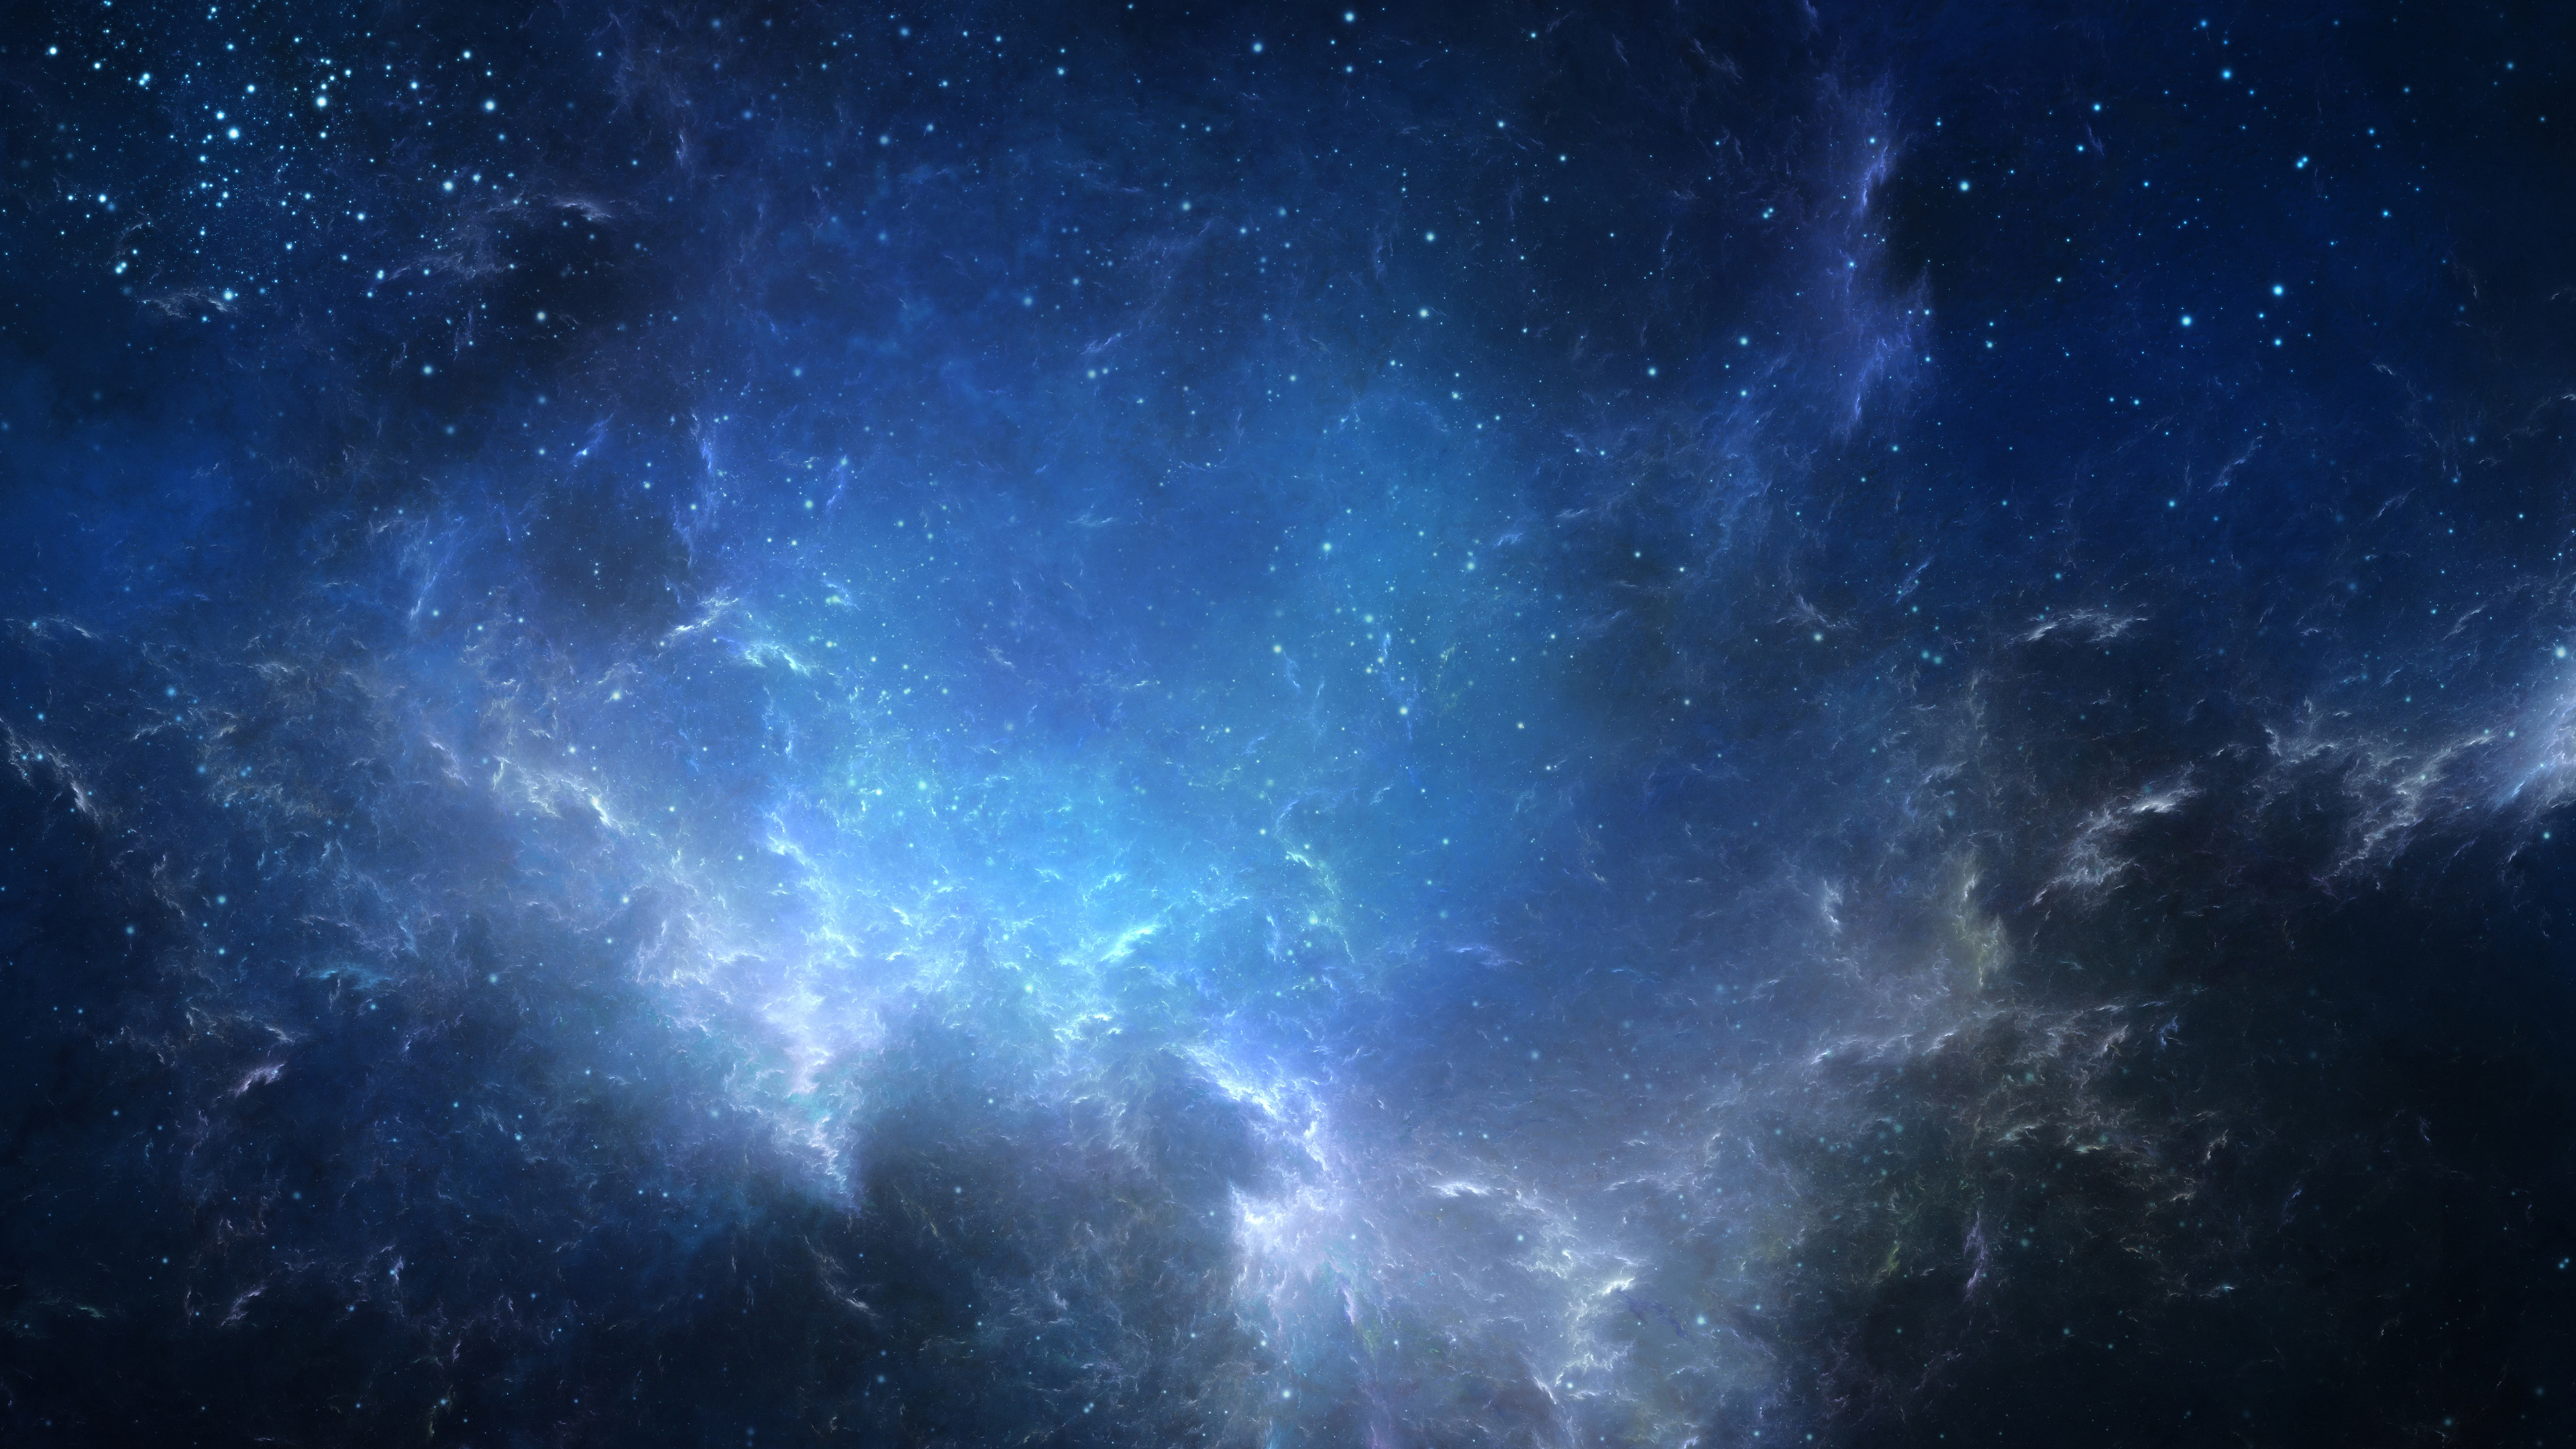 Space / Stars Wallpaper - Stars 4k , HD Wallpaper & Backgrounds